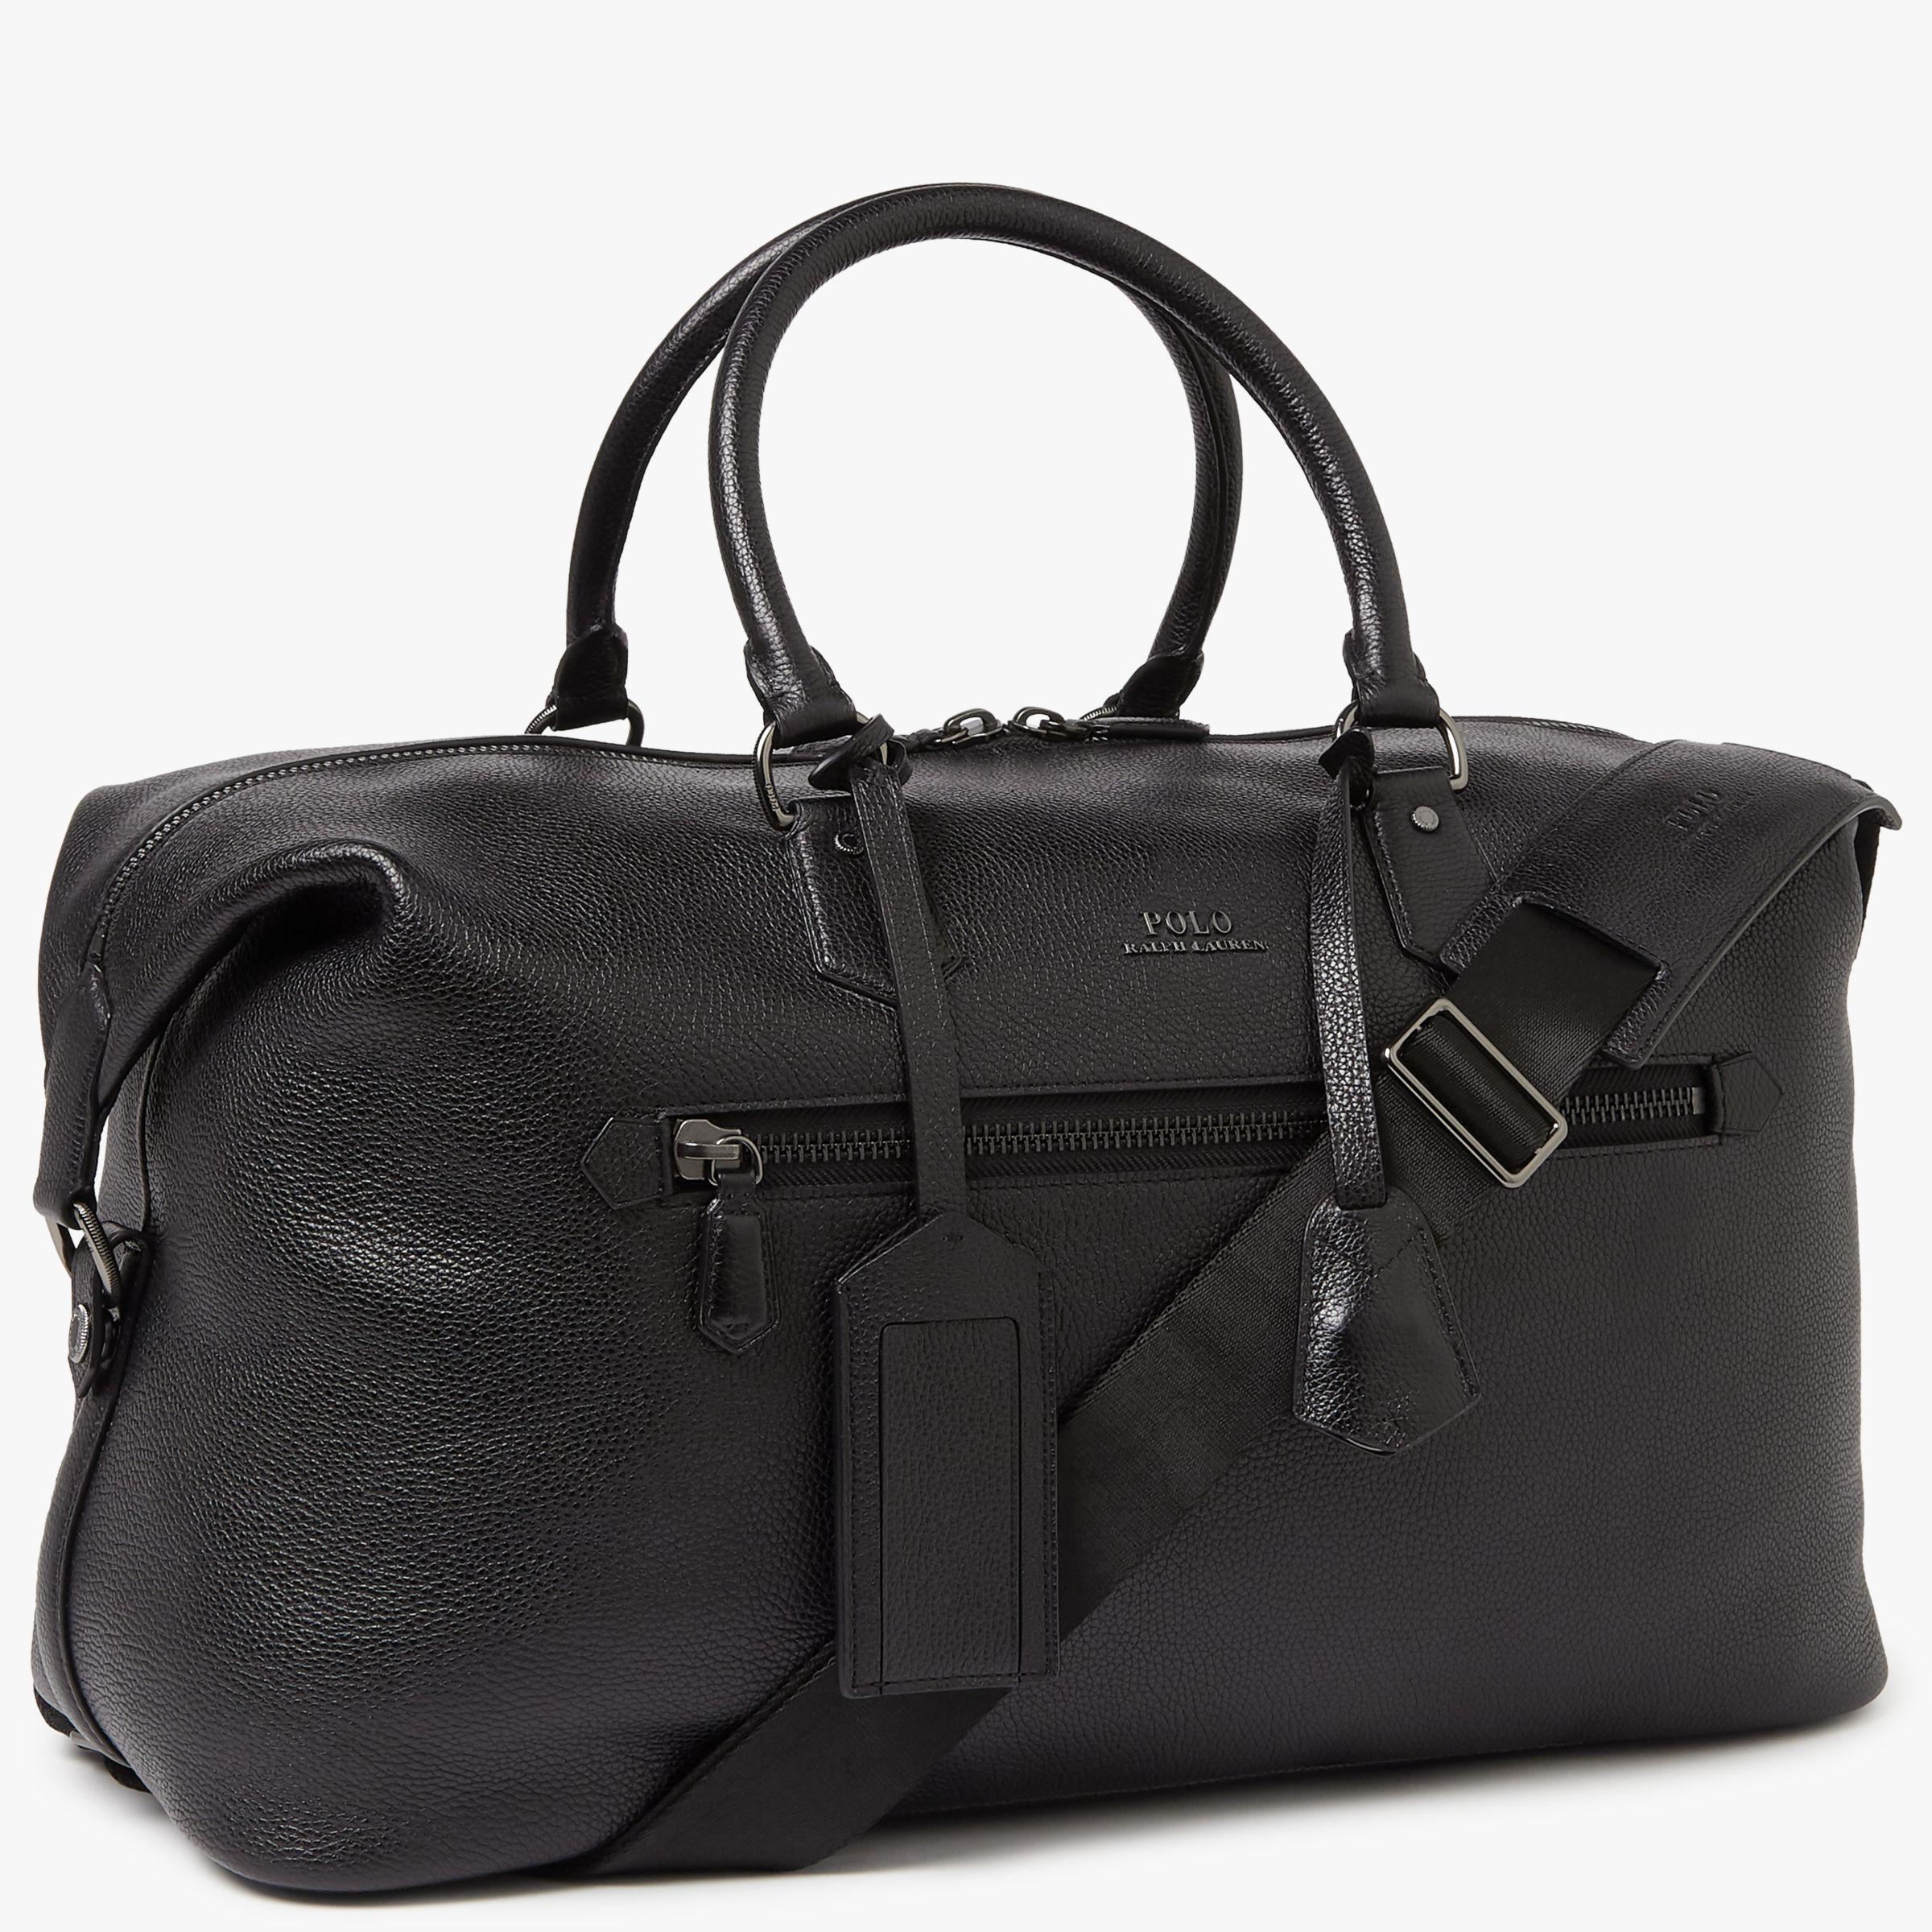 Polo Ralph Lauren Pebble Leather Duffle Bag, Black at John Lewis   Partners 5757be7dec